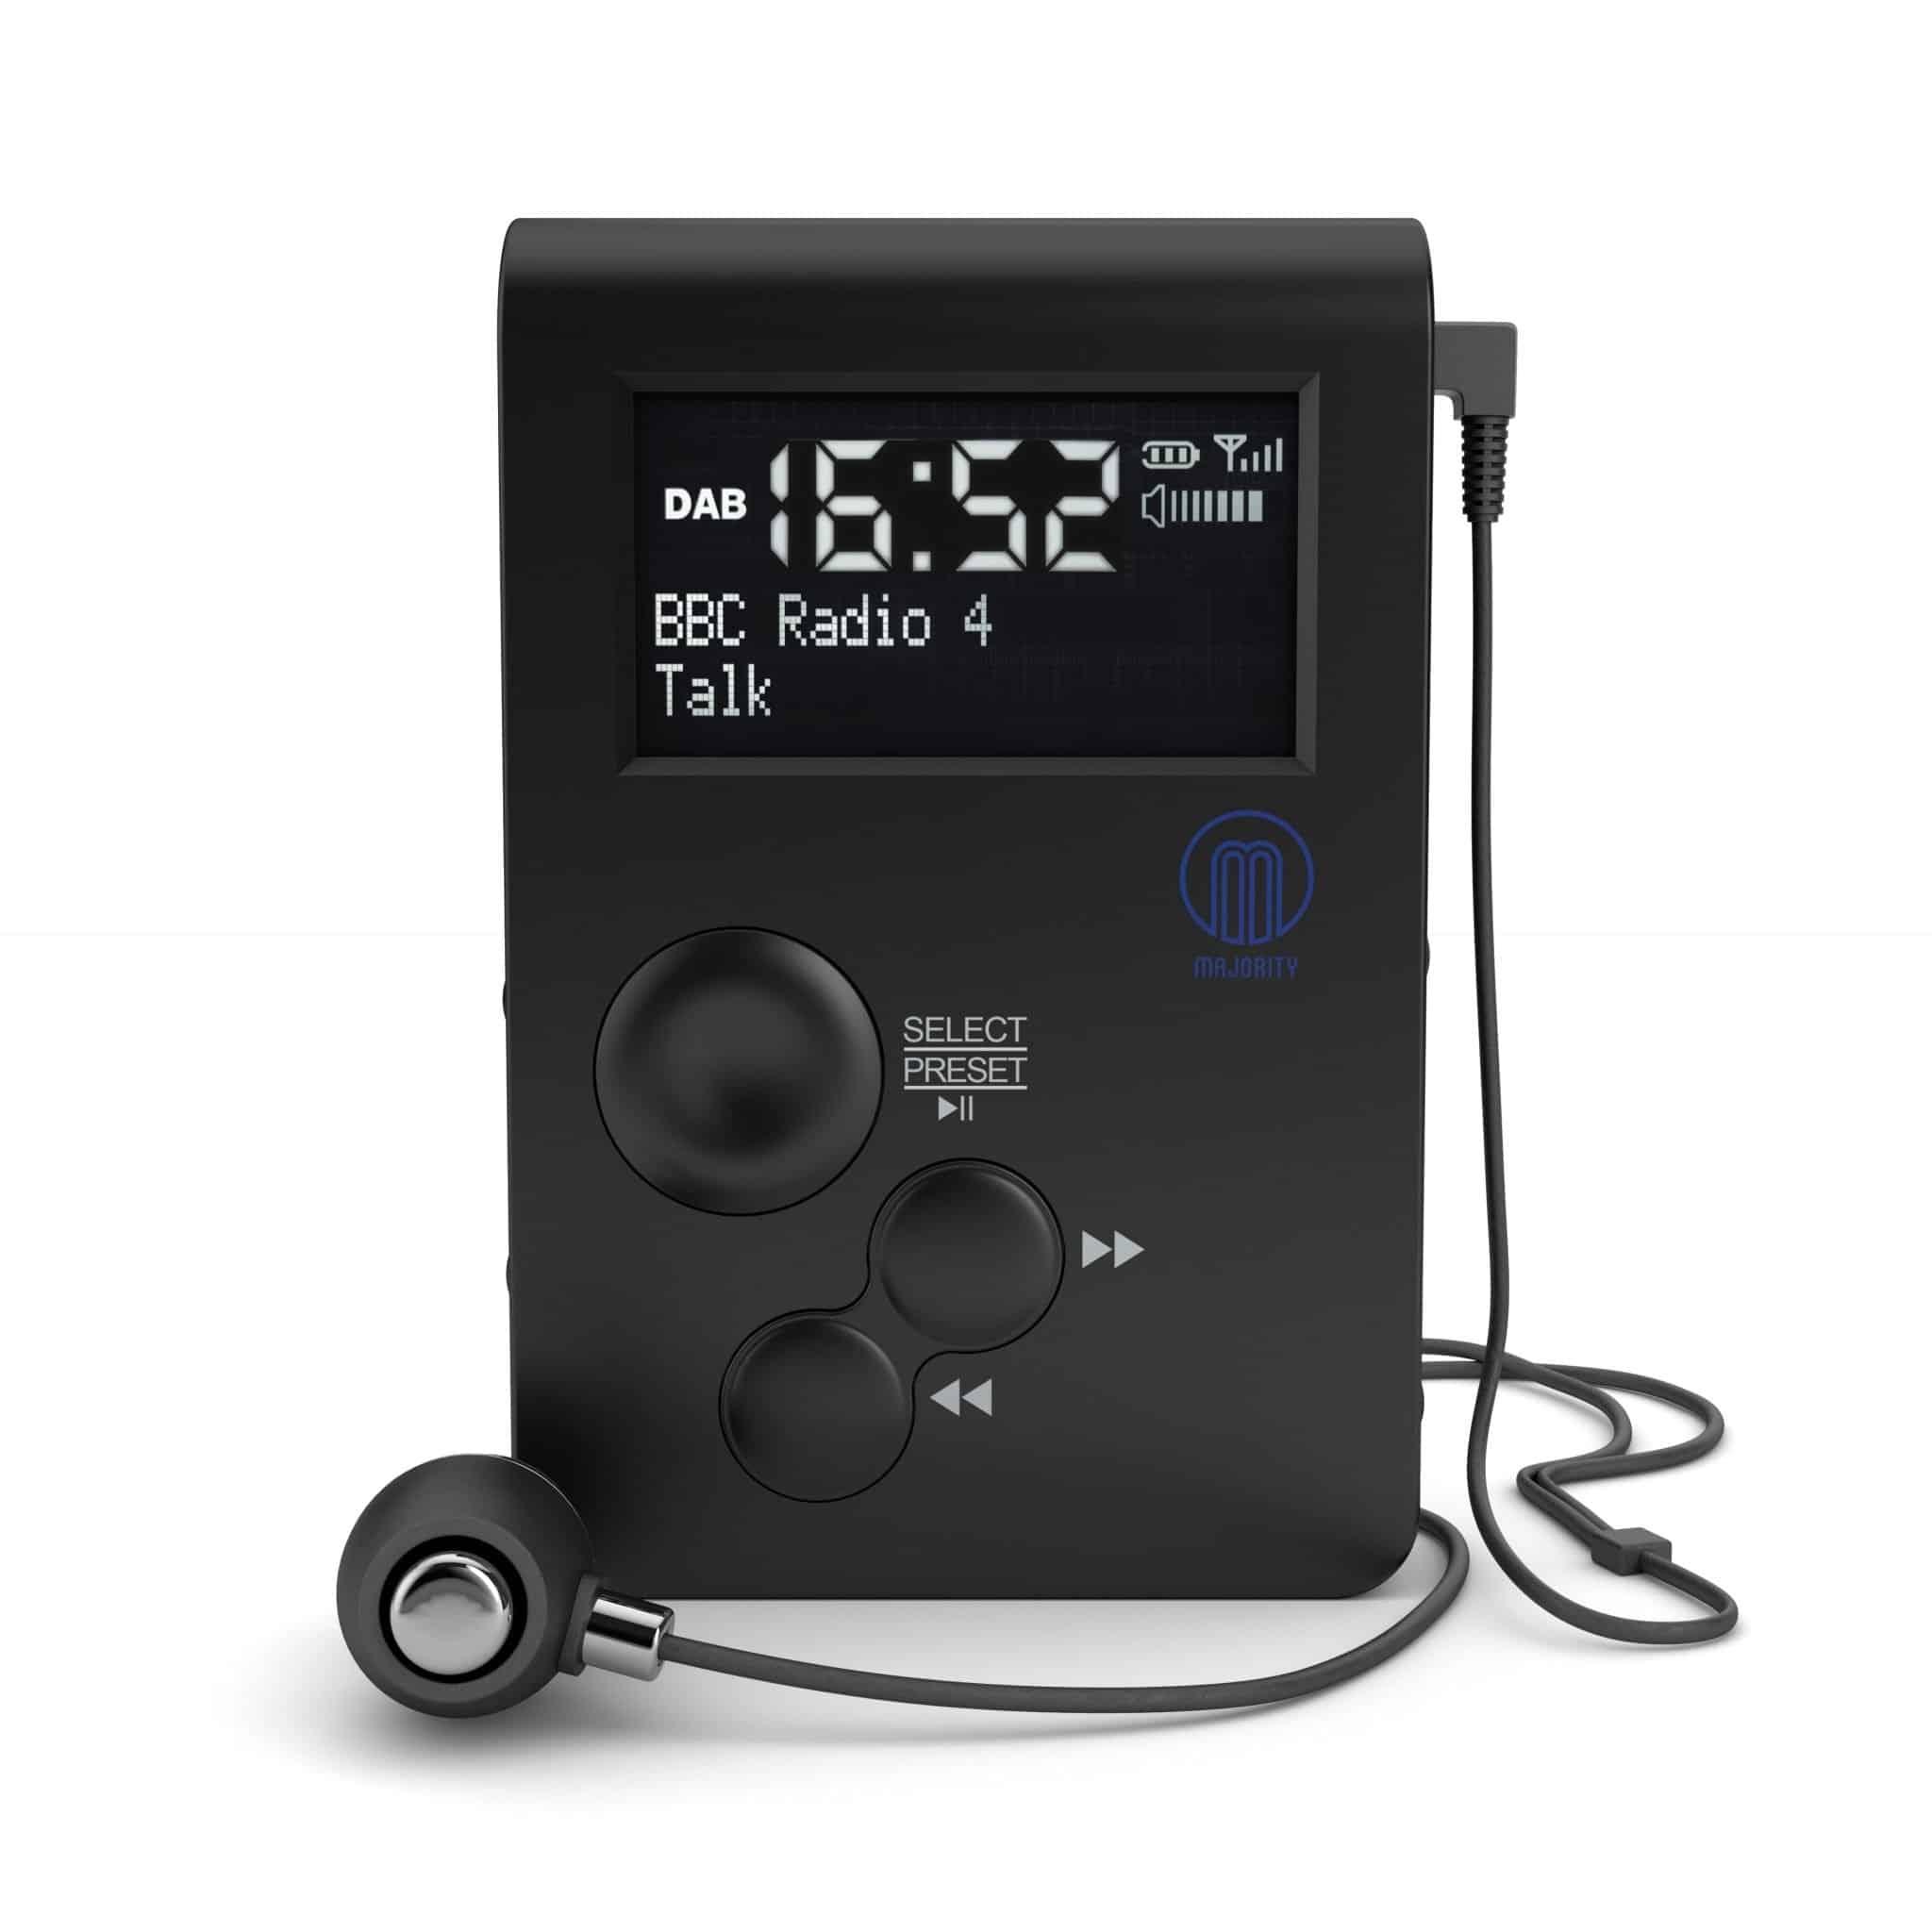 Majority Parkside Go Pocket DAB Radio